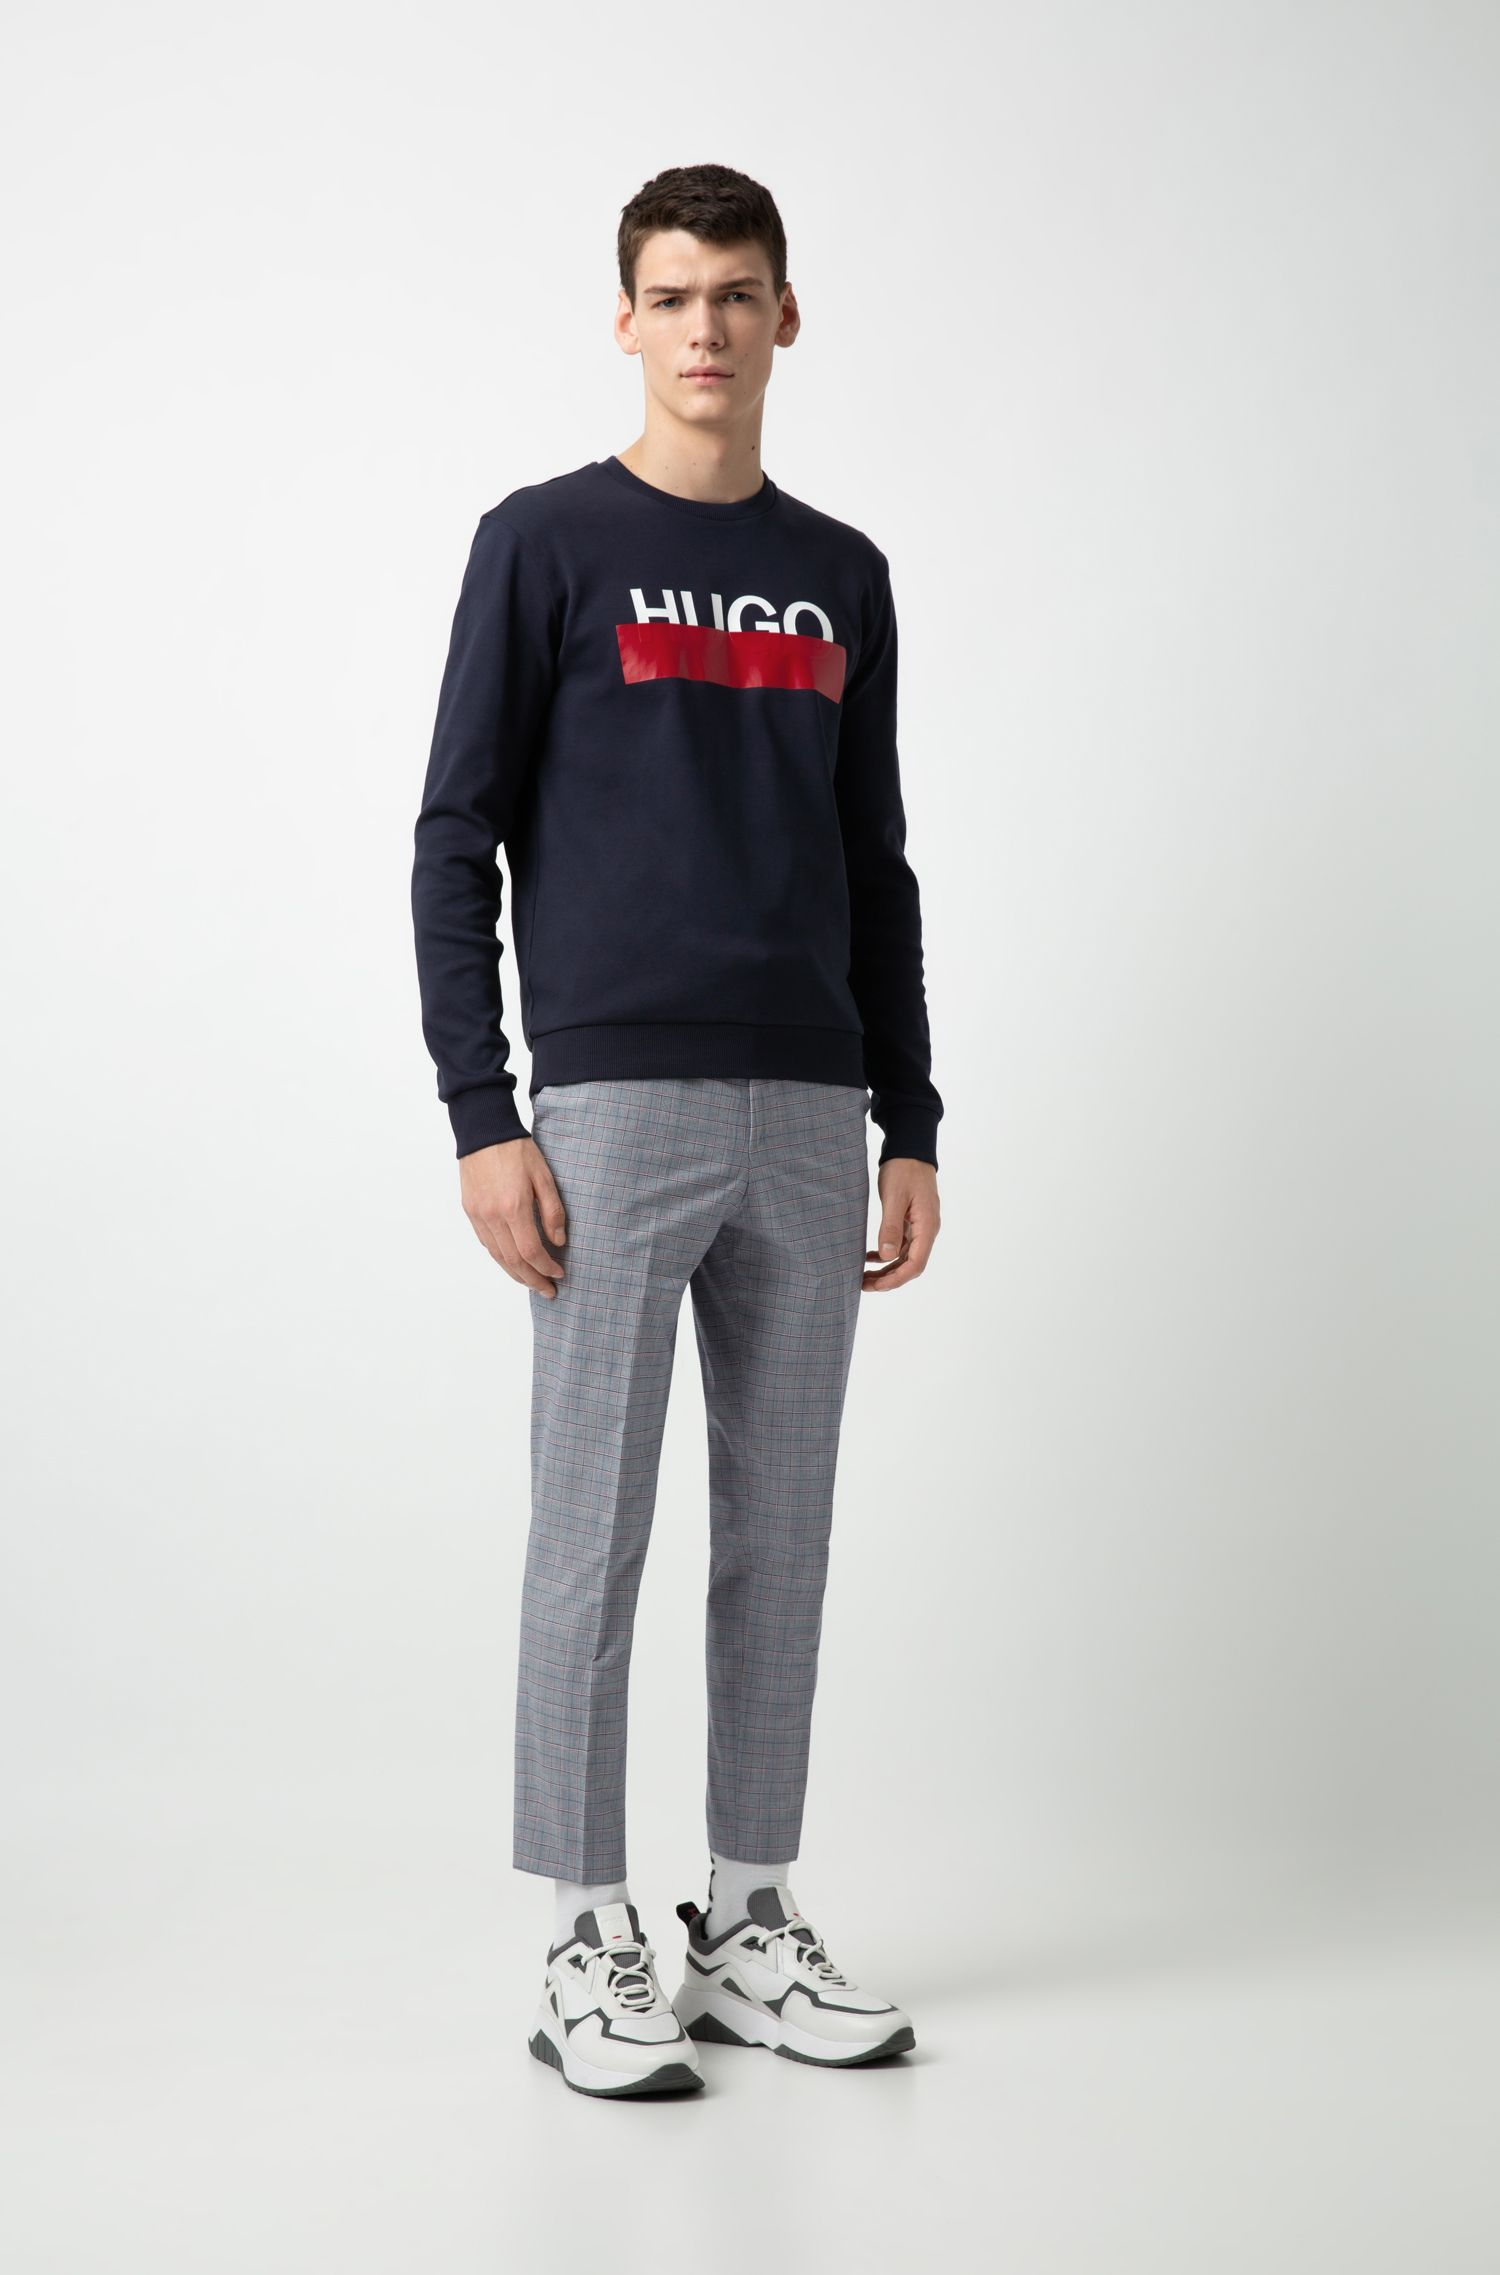 Hugo Boss - Interlock-cotton sweatshirt with partially concealed logo - 2